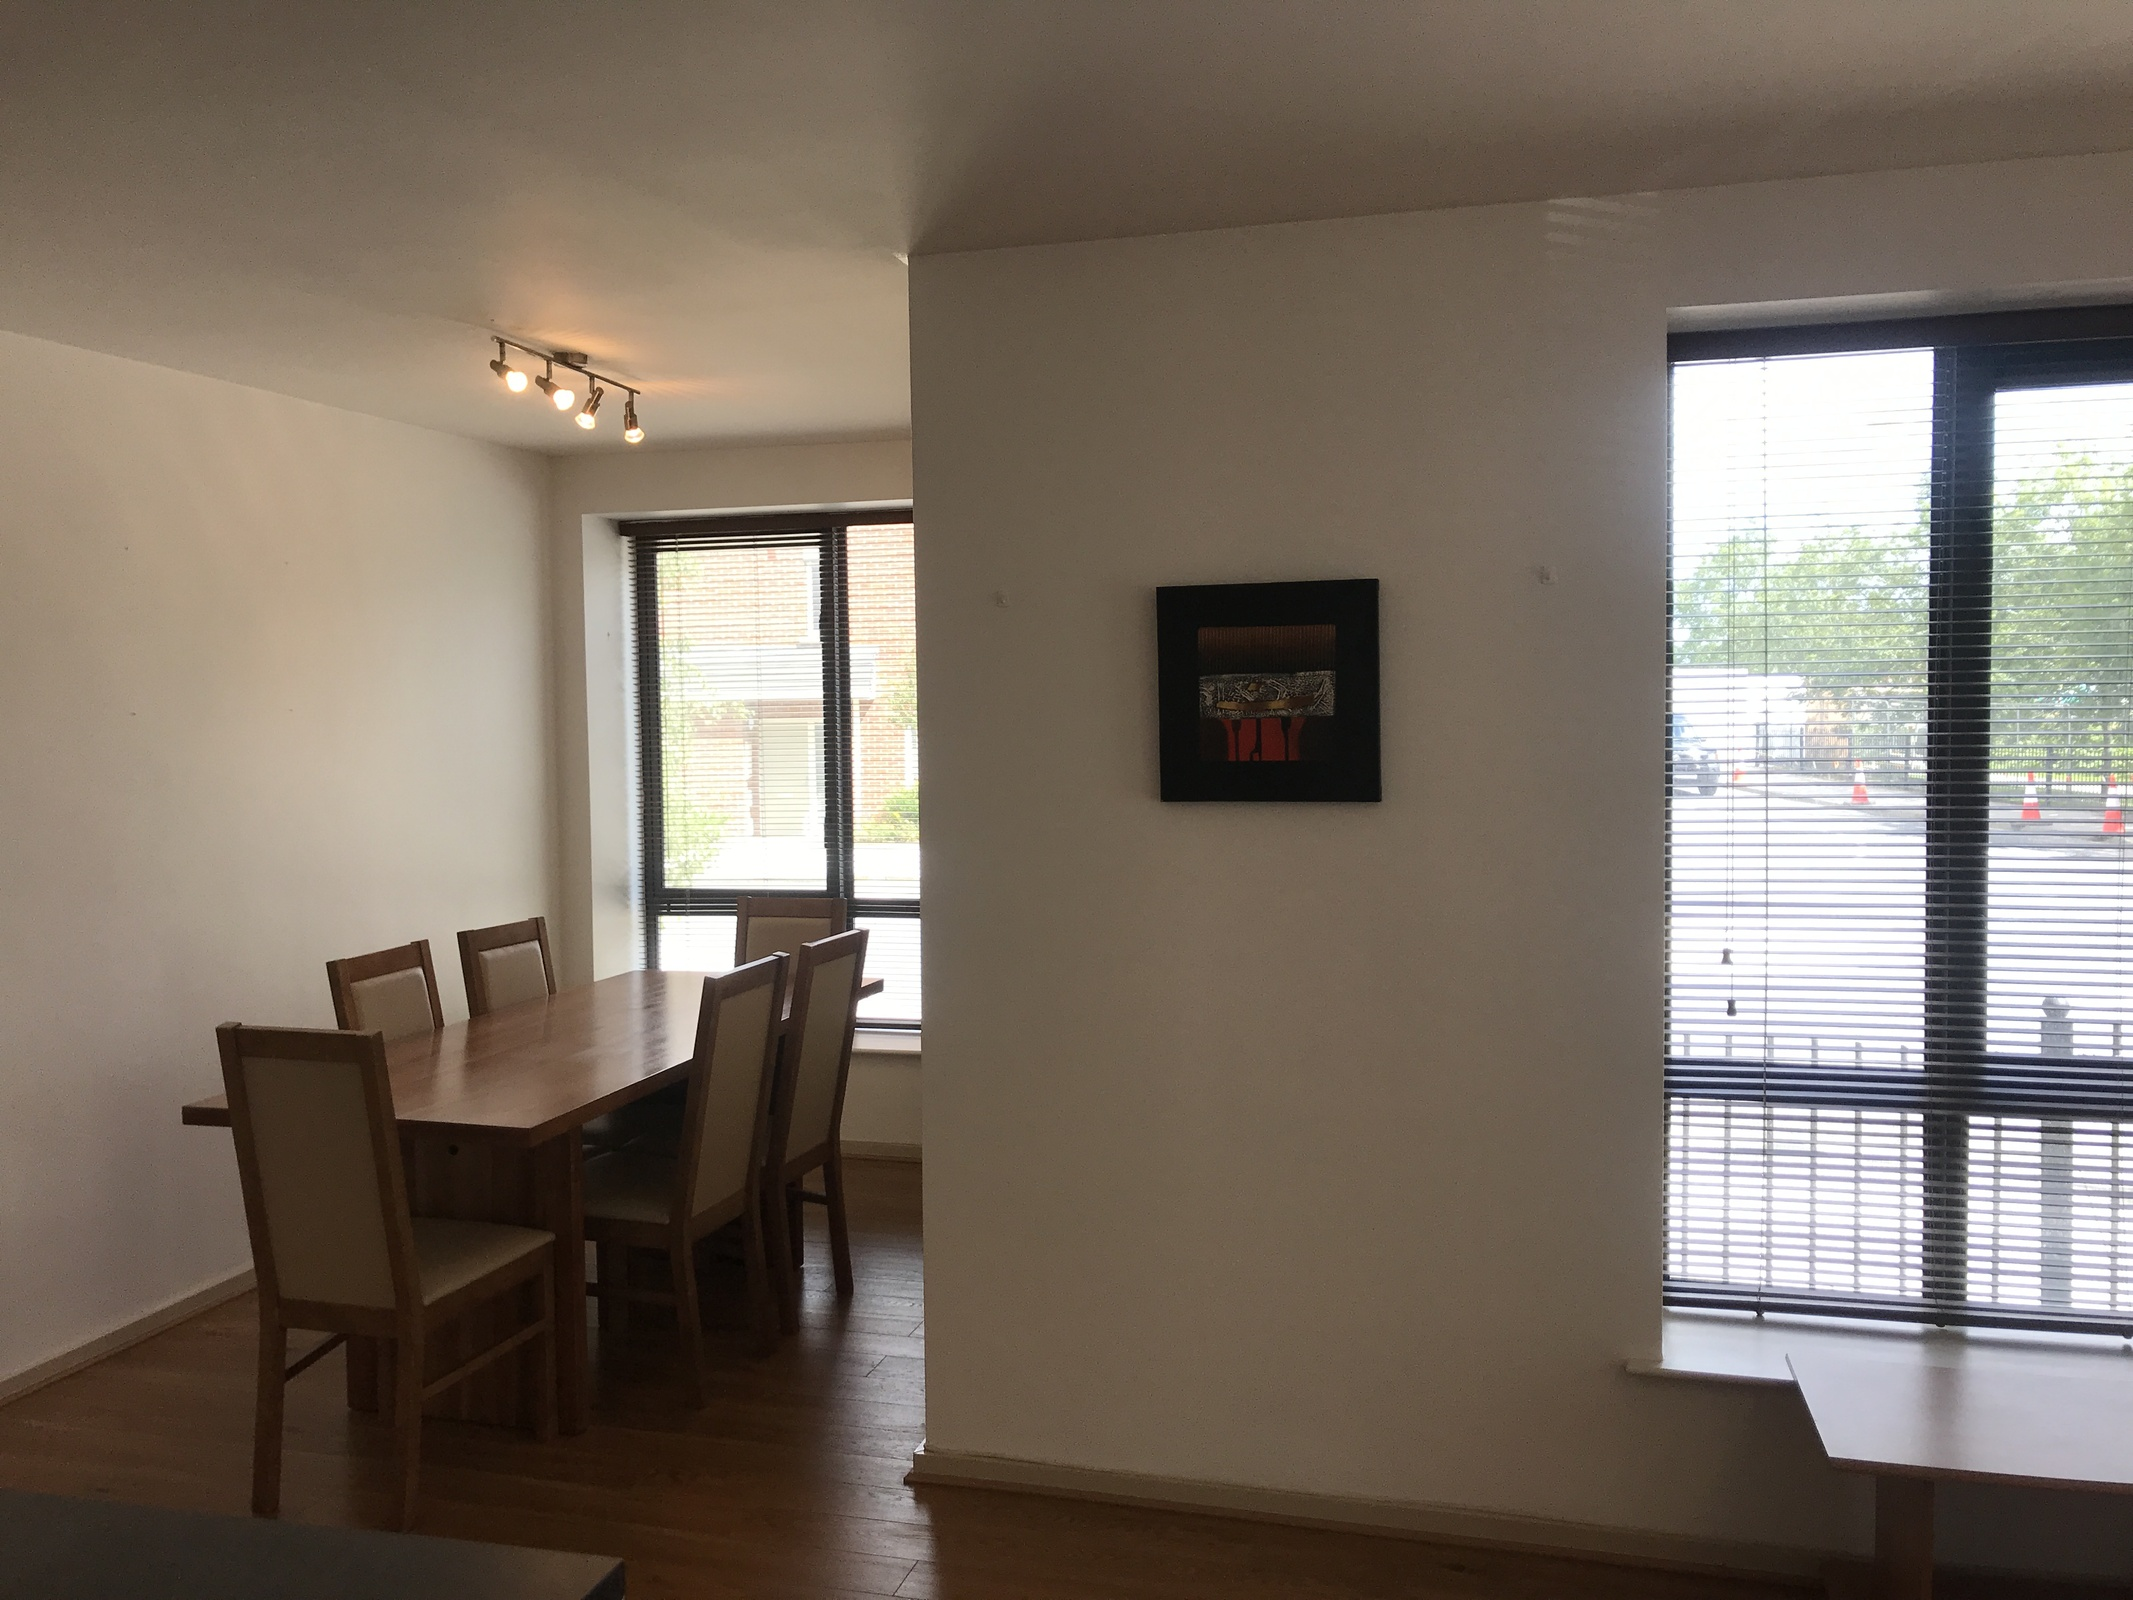 Apartment 2, Watermint Court, Phelan Avenue, Ashtown, Dublin 15